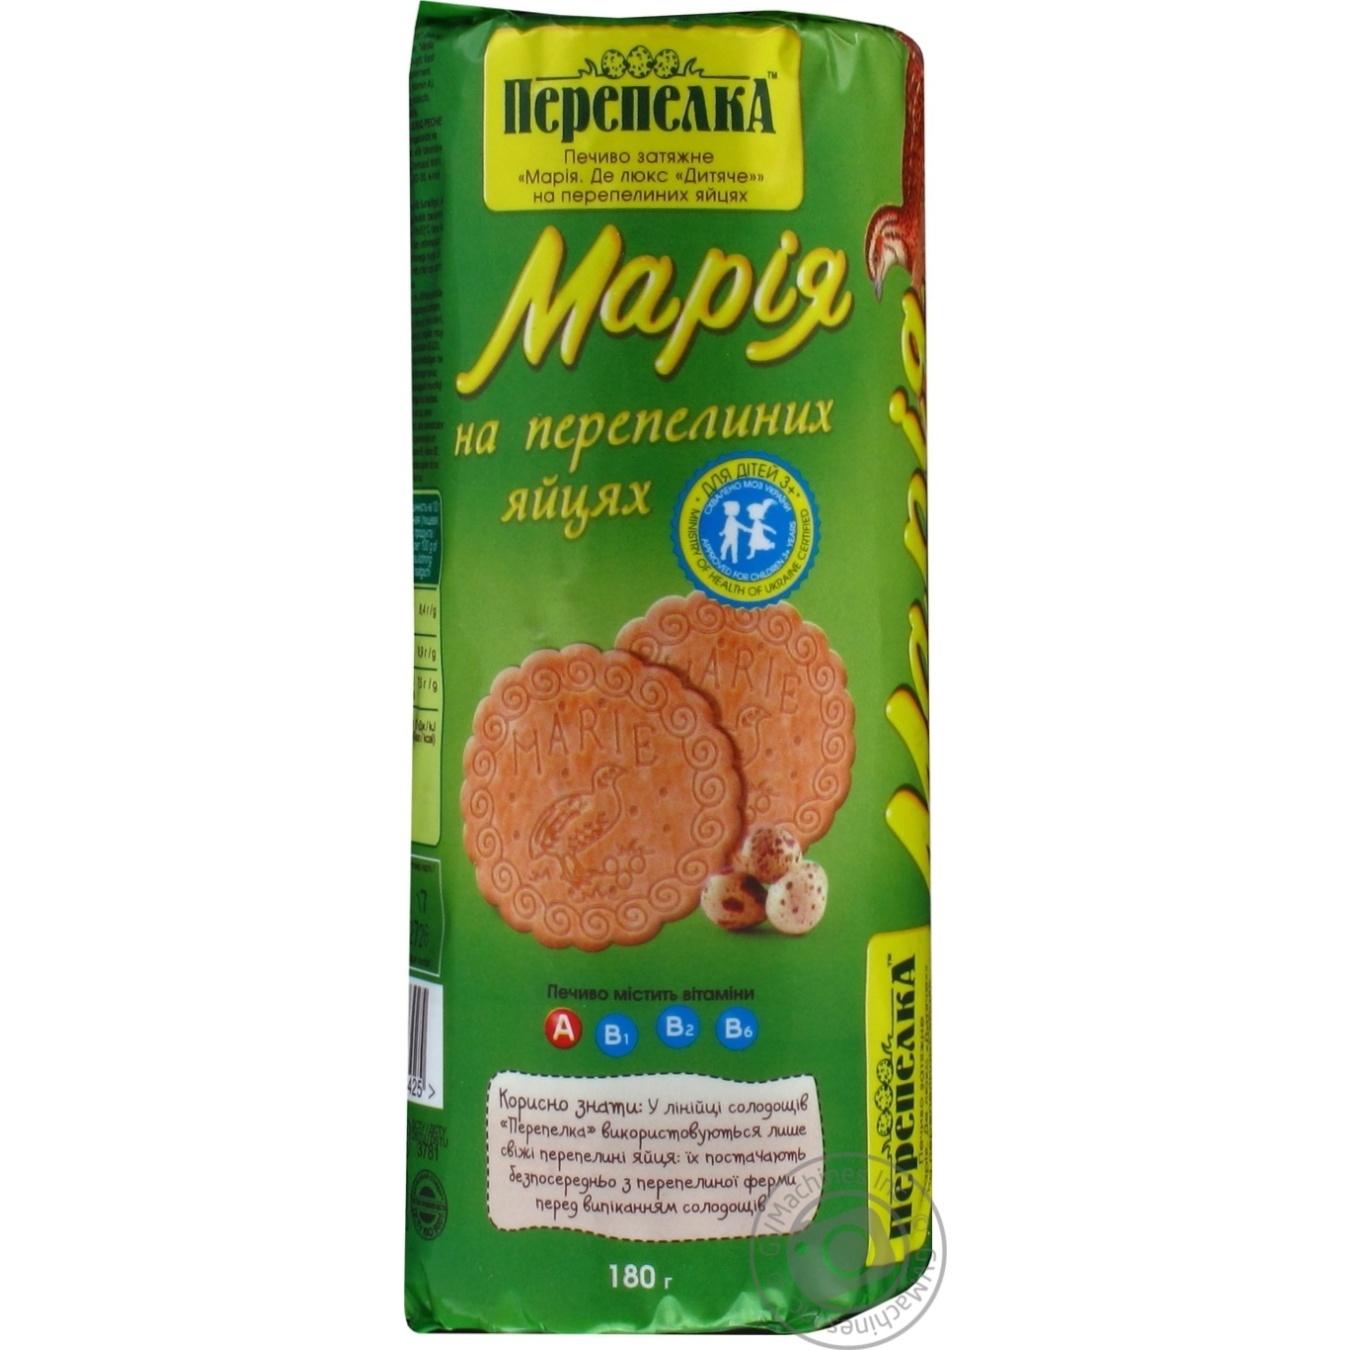 ПЕР-ЛКА ПЧ МАРІЯ ПЕР. Я-Х 180Г